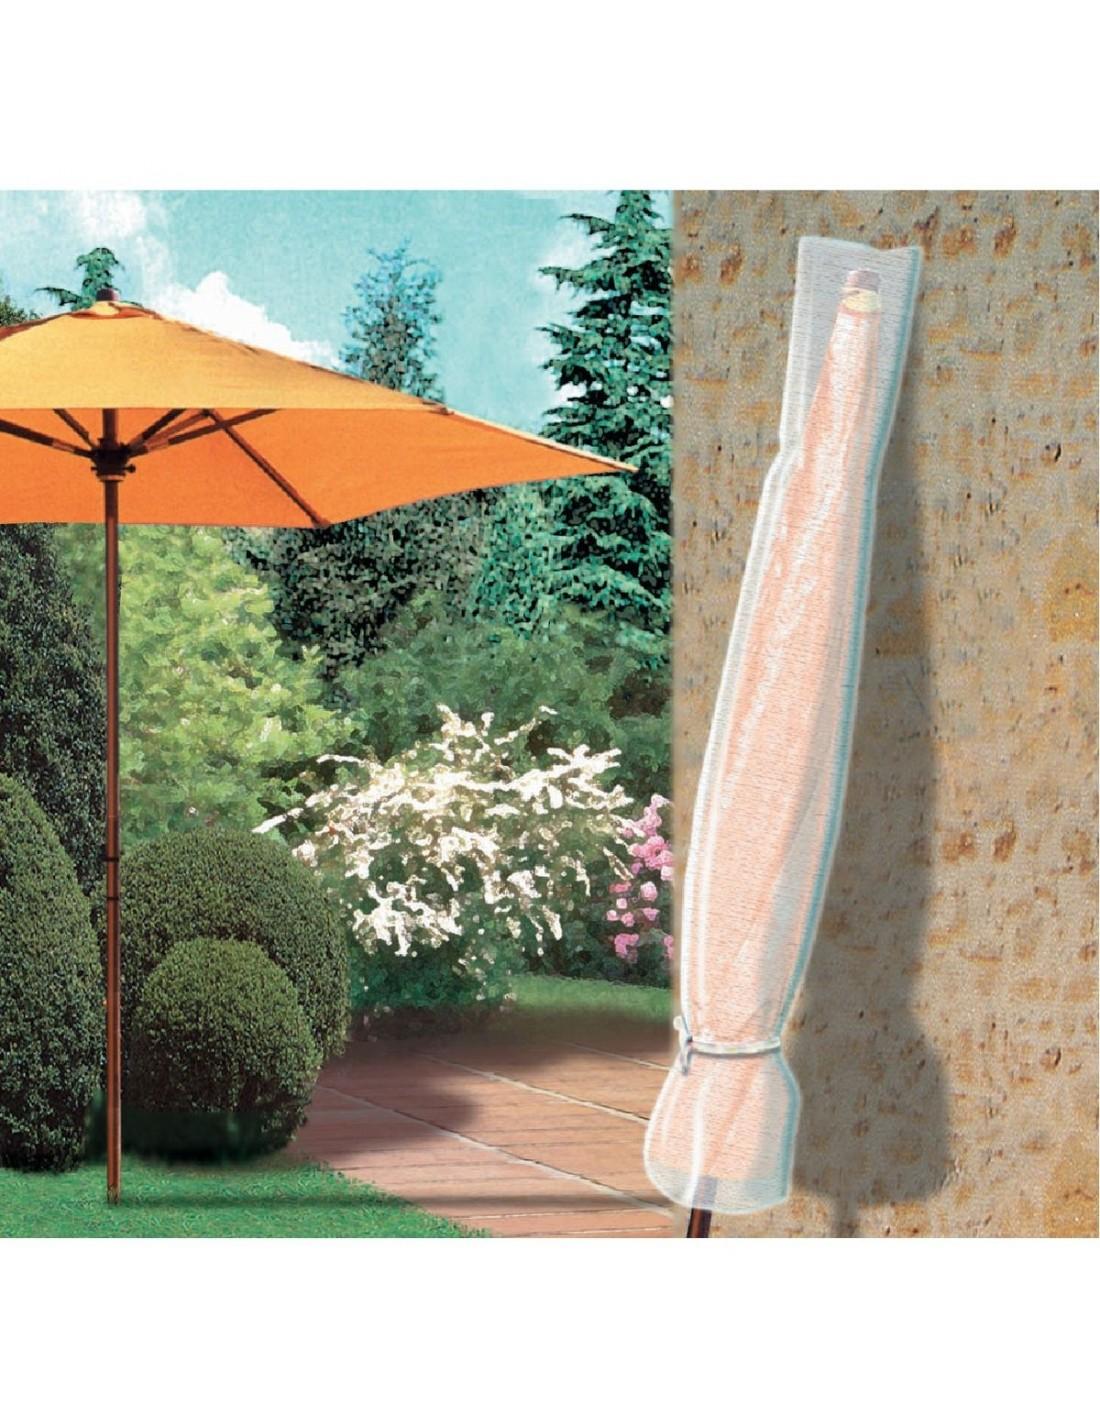 housse parasol housse parasol houpar. Black Bedroom Furniture Sets. Home Design Ideas